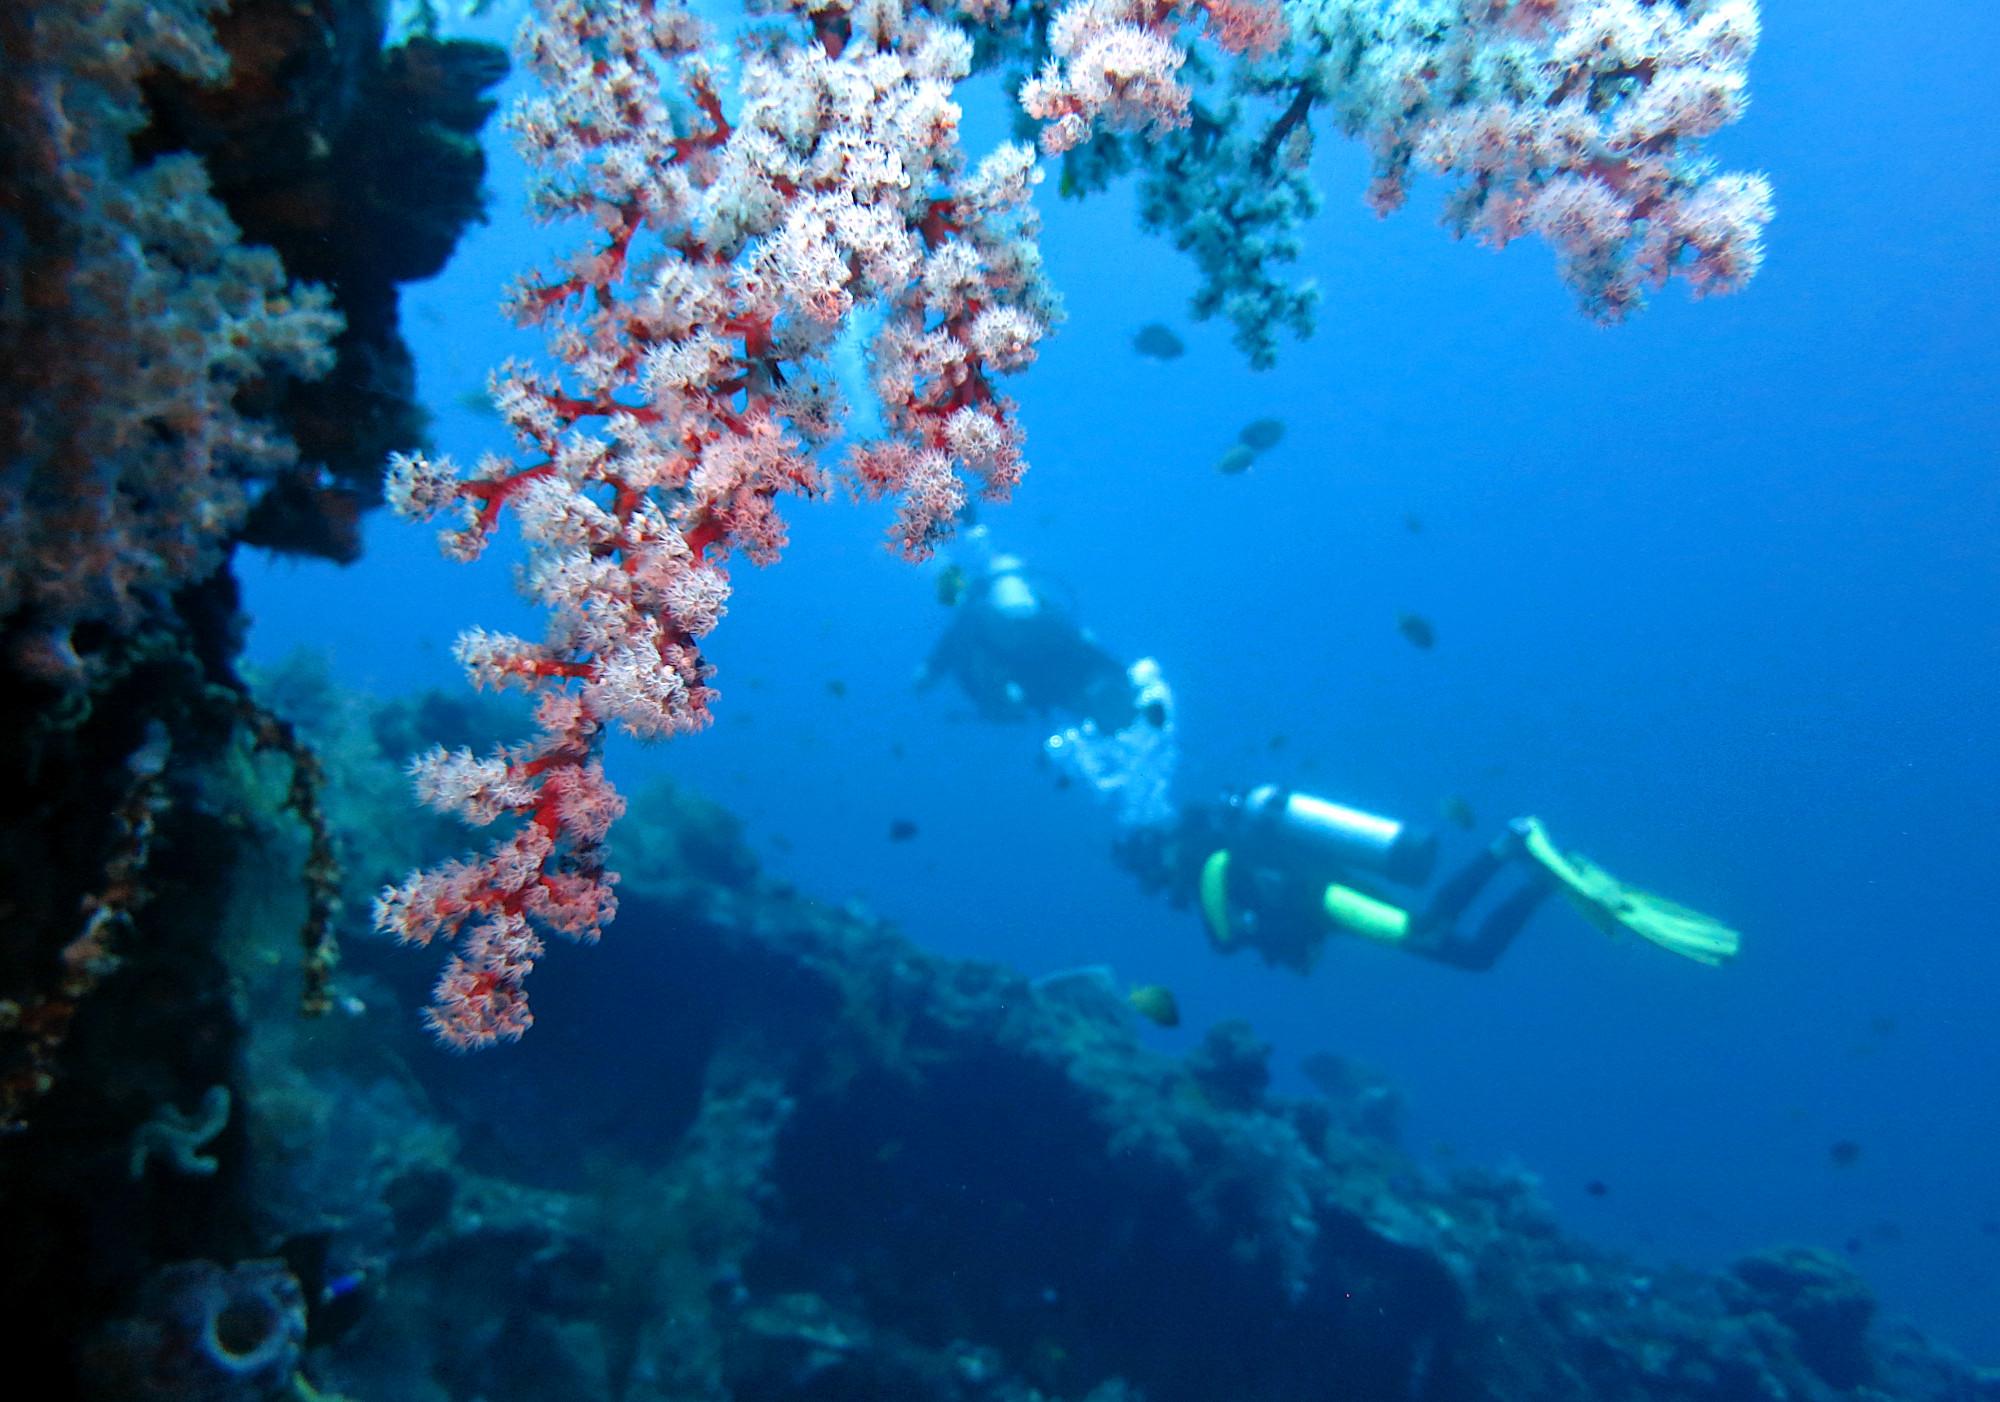 Diving in Tulamben - Liberty shipwreck - Bali Indoensia